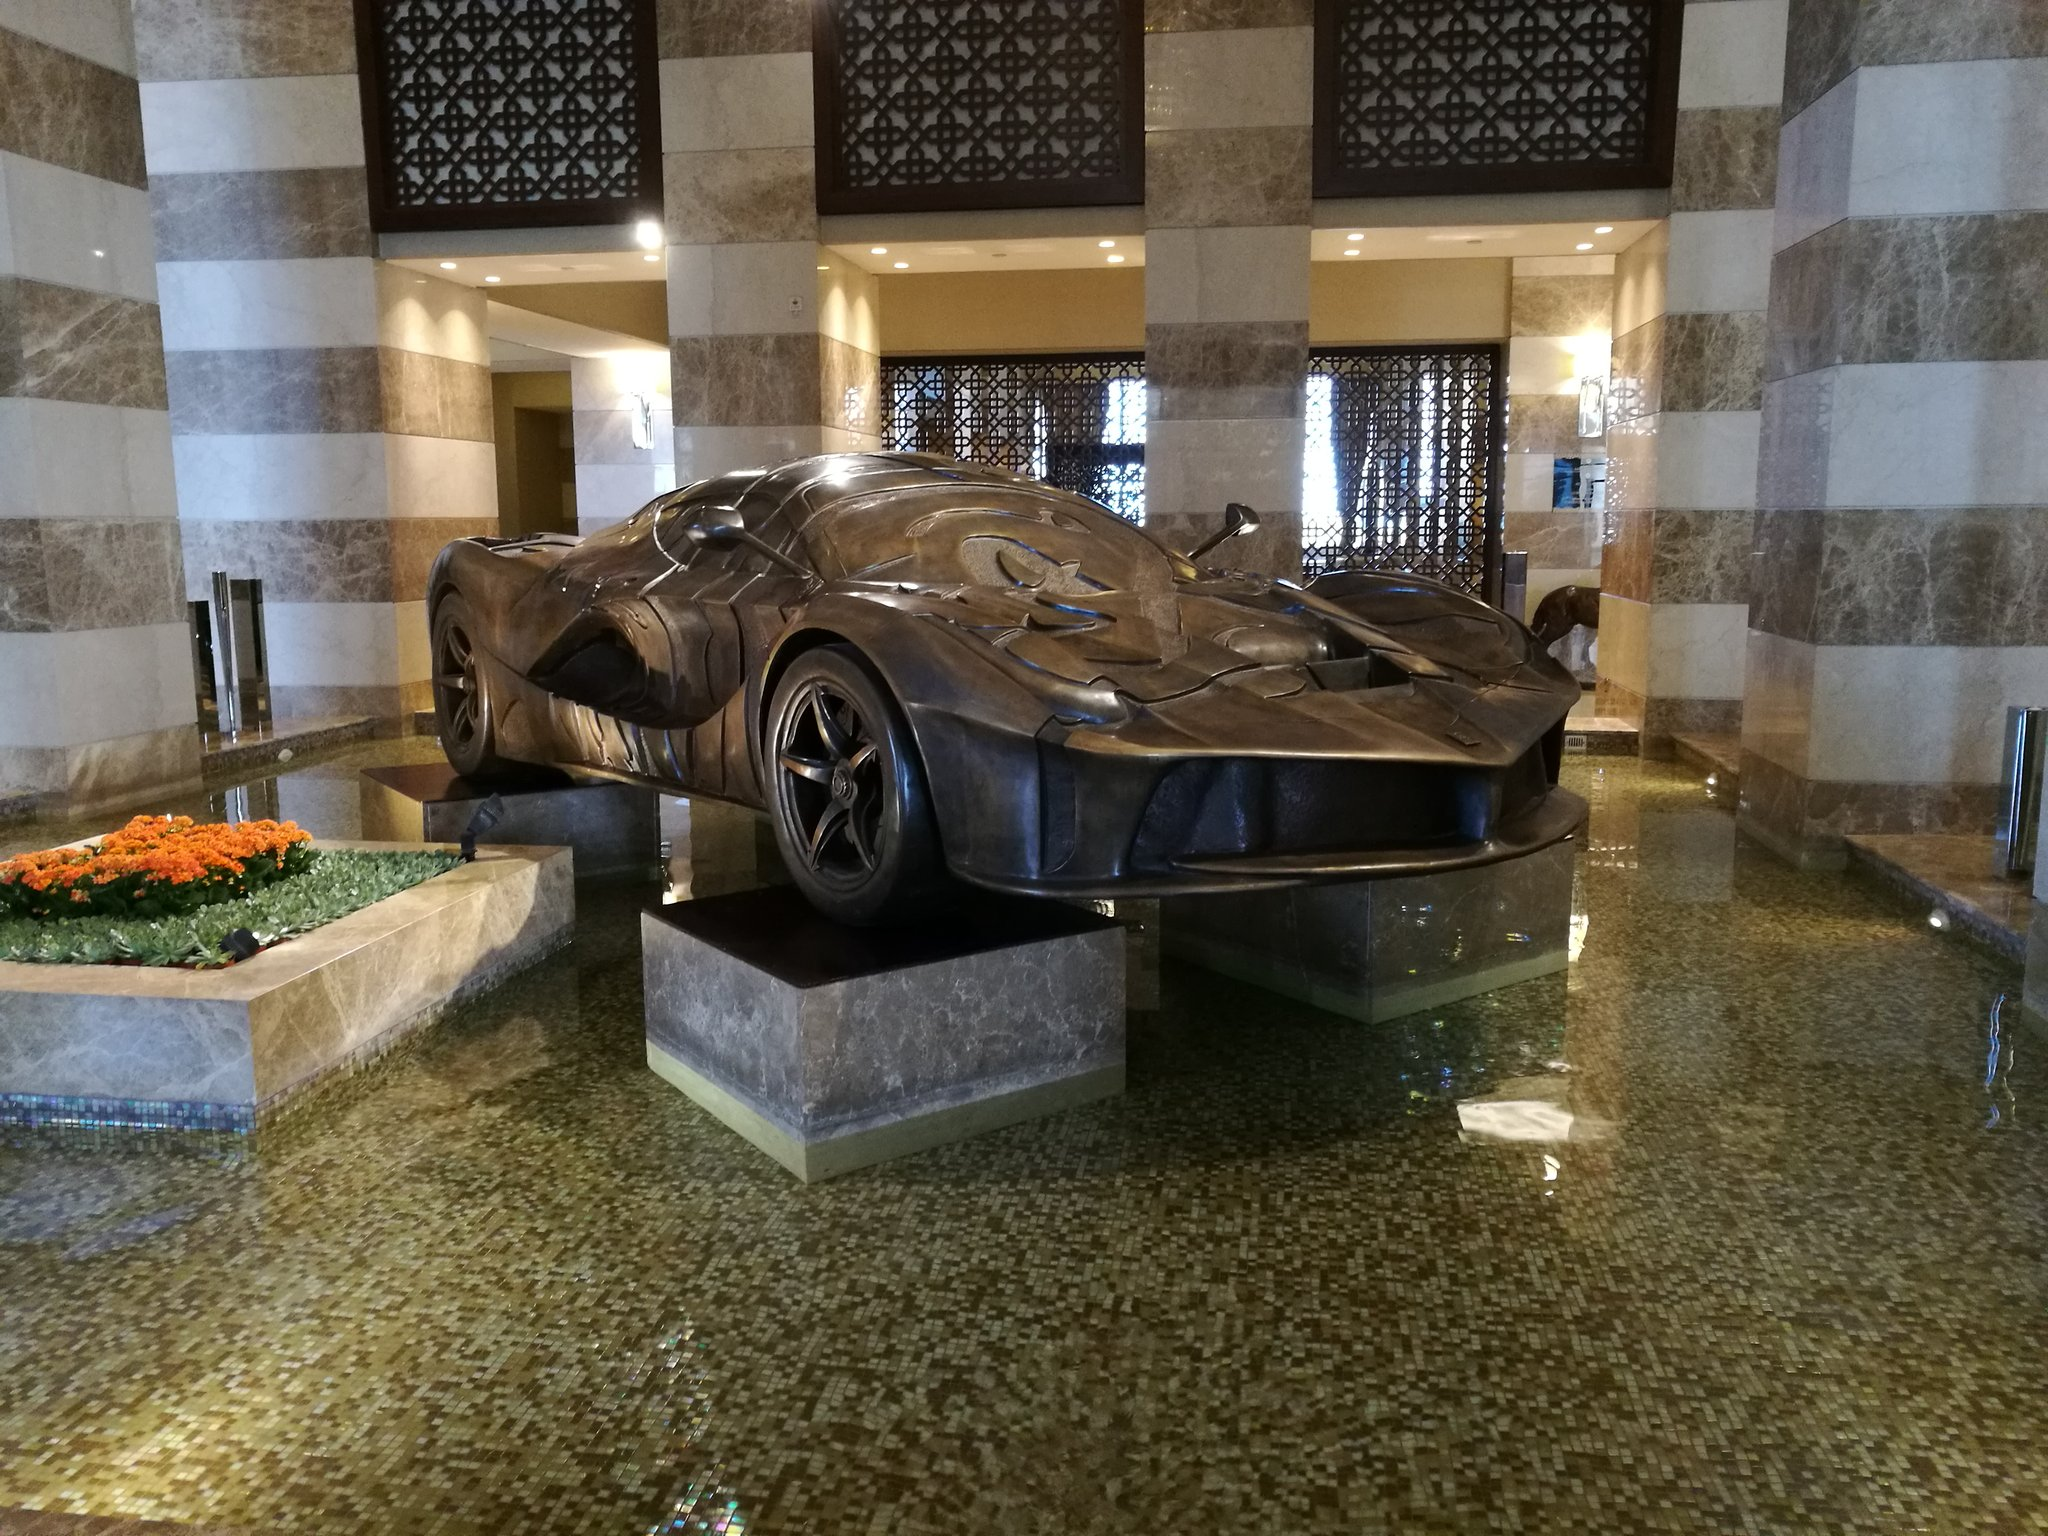 Ferrari https://t.co/Y6jcSoTFW3